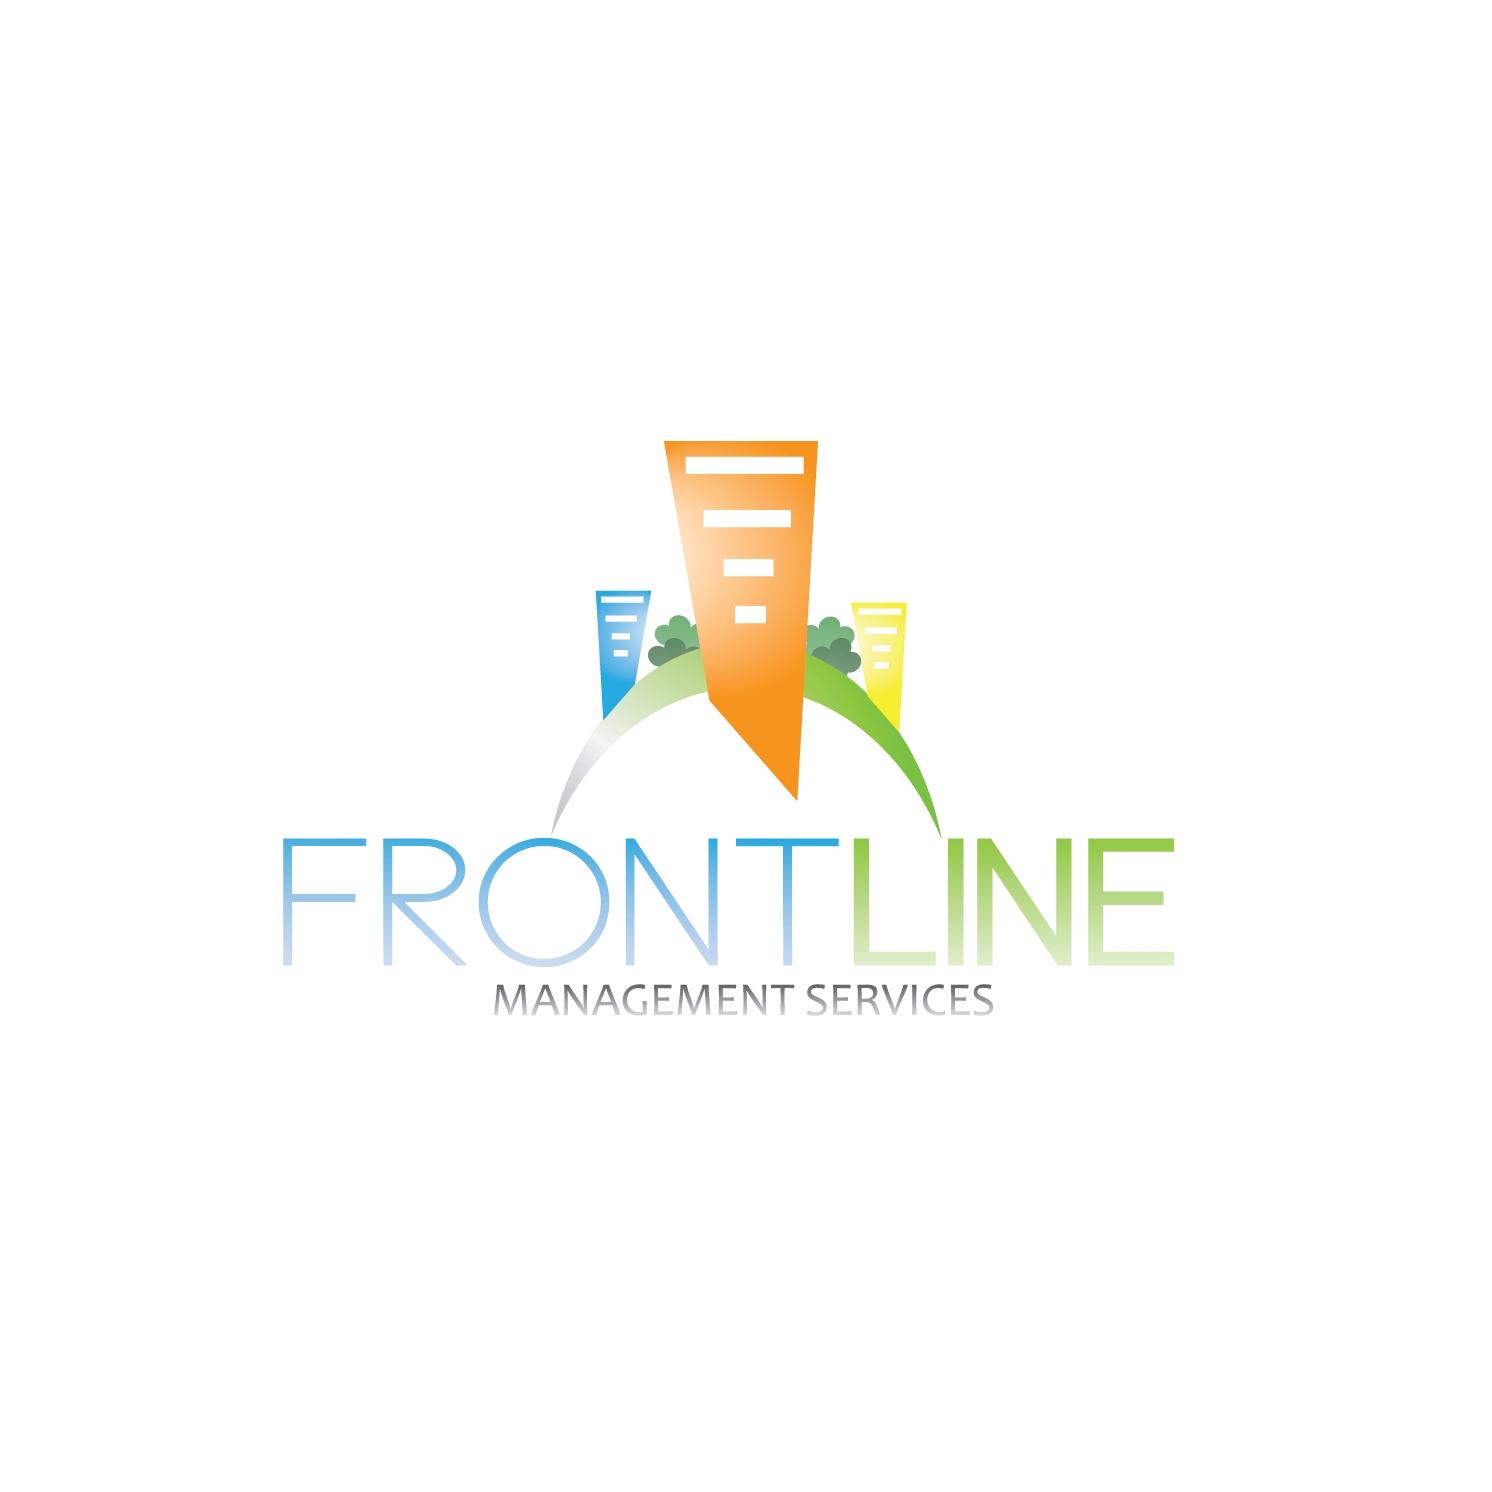 Frontline Management Services LLC